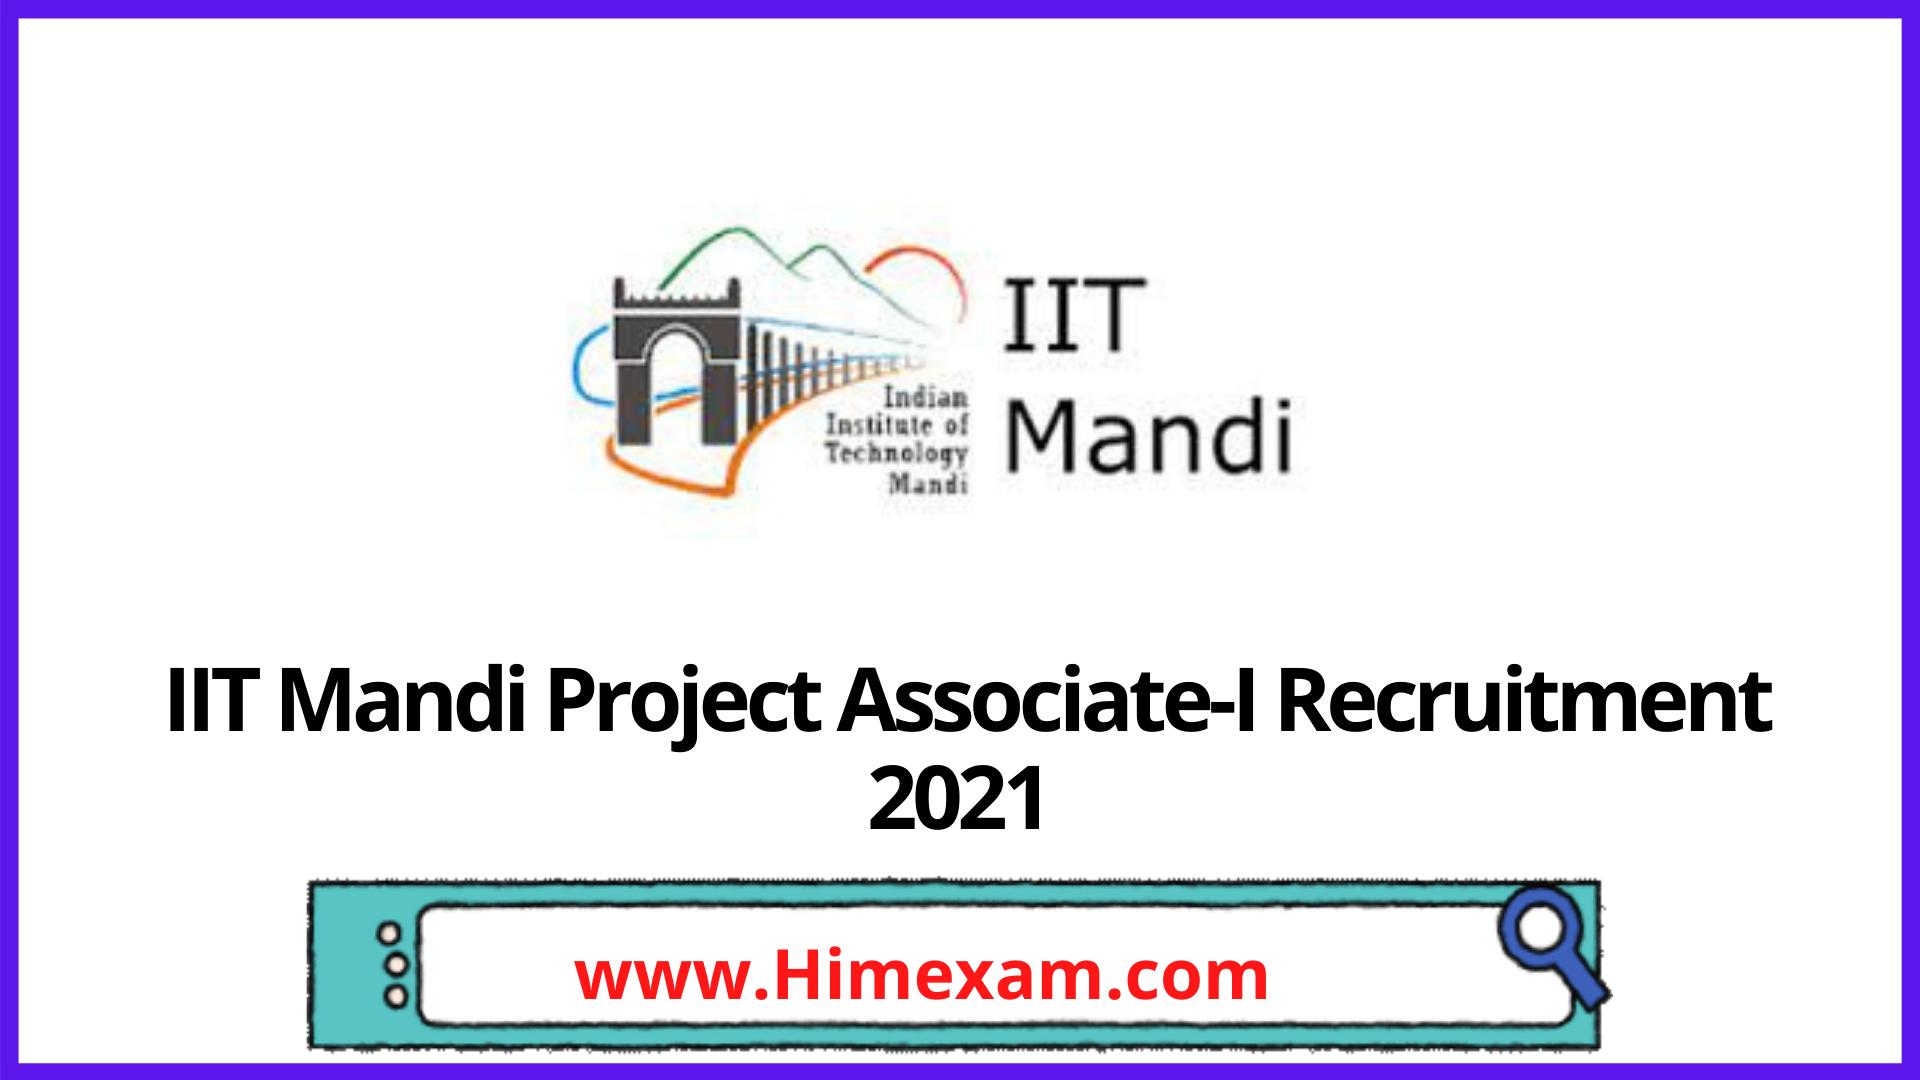 IIT Mandi Project Associate-I Recruitment 2021